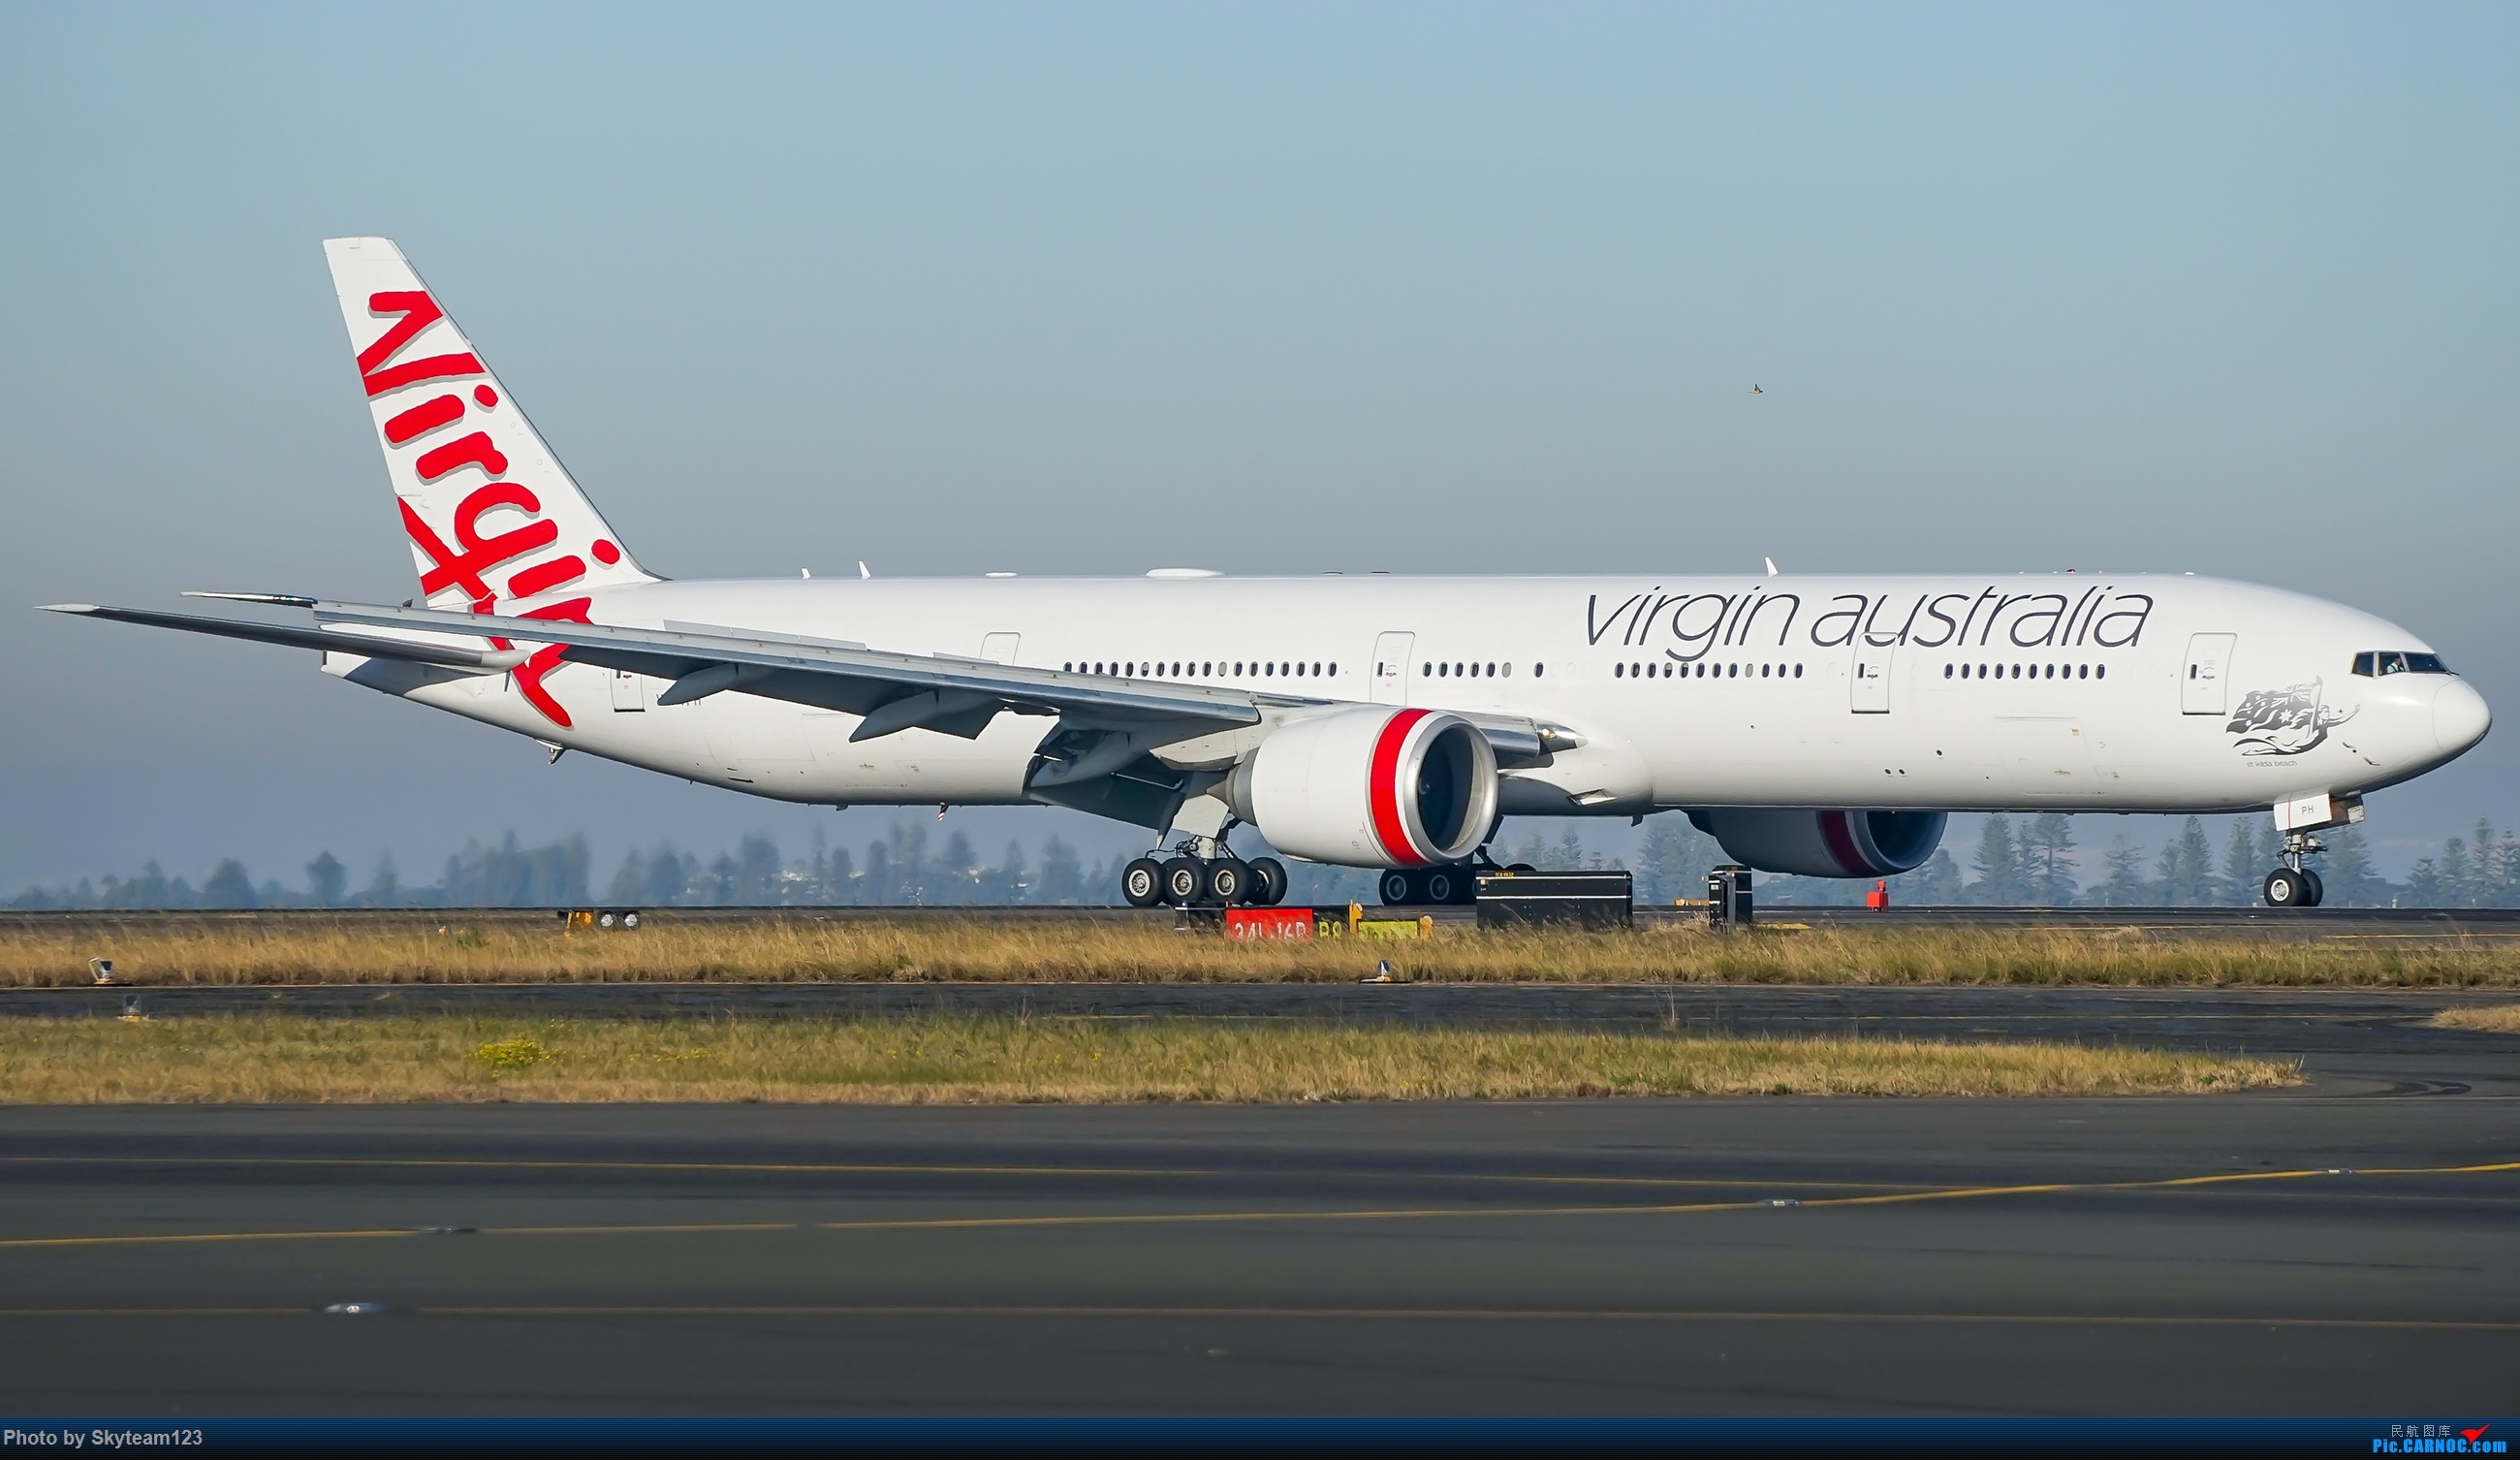 Re:[原创][SYD] 再访Blu EMU停车场 早上34L抵港出发杂图几张 BOEING 777-300ER VH-VPH 澳大利亚悉尼金斯福德·史密斯机场